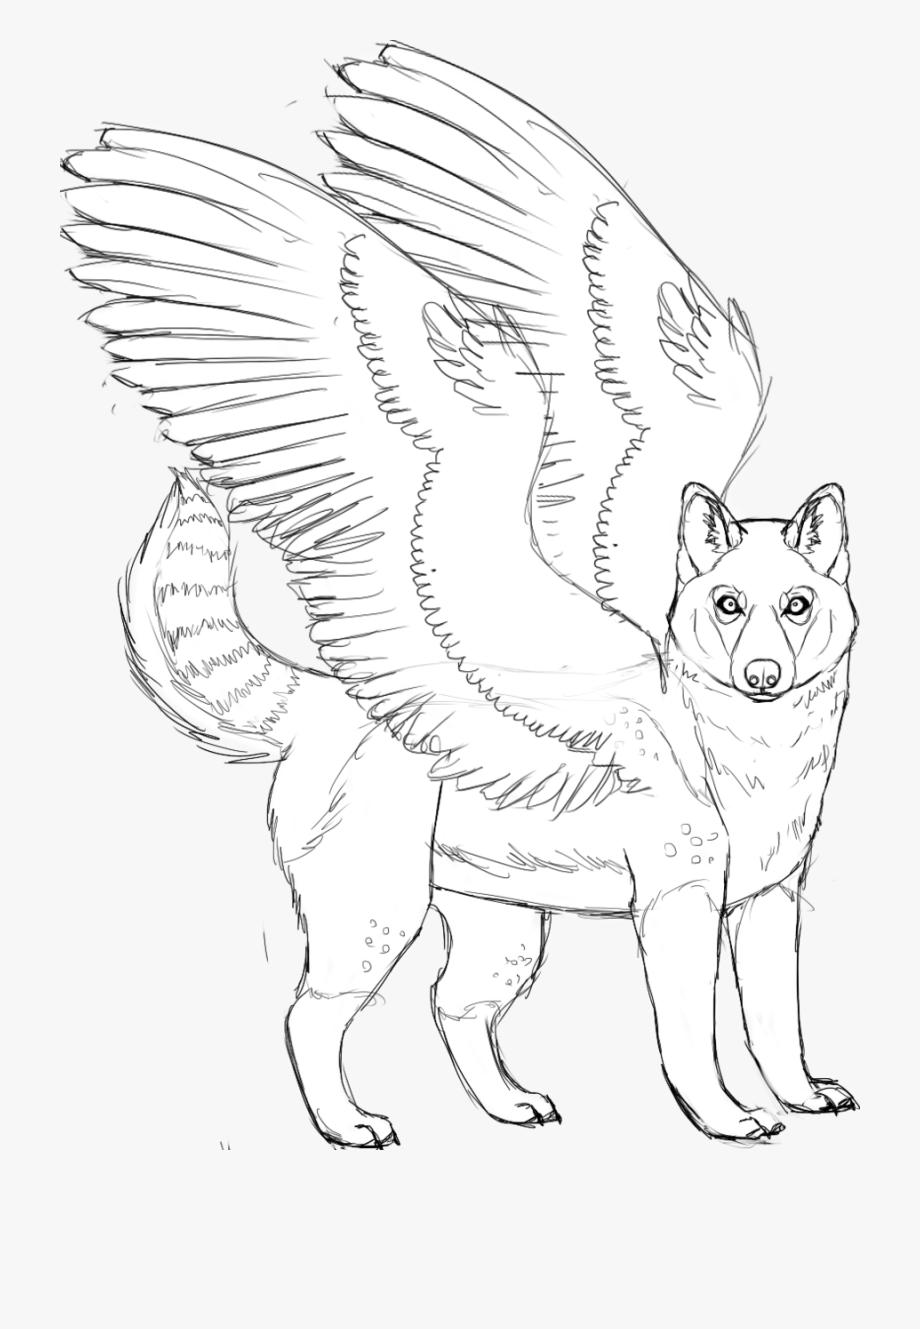 Husky Coloring Page : husky, coloring, Husky, Coloring, Pages, Pictures, Transparent